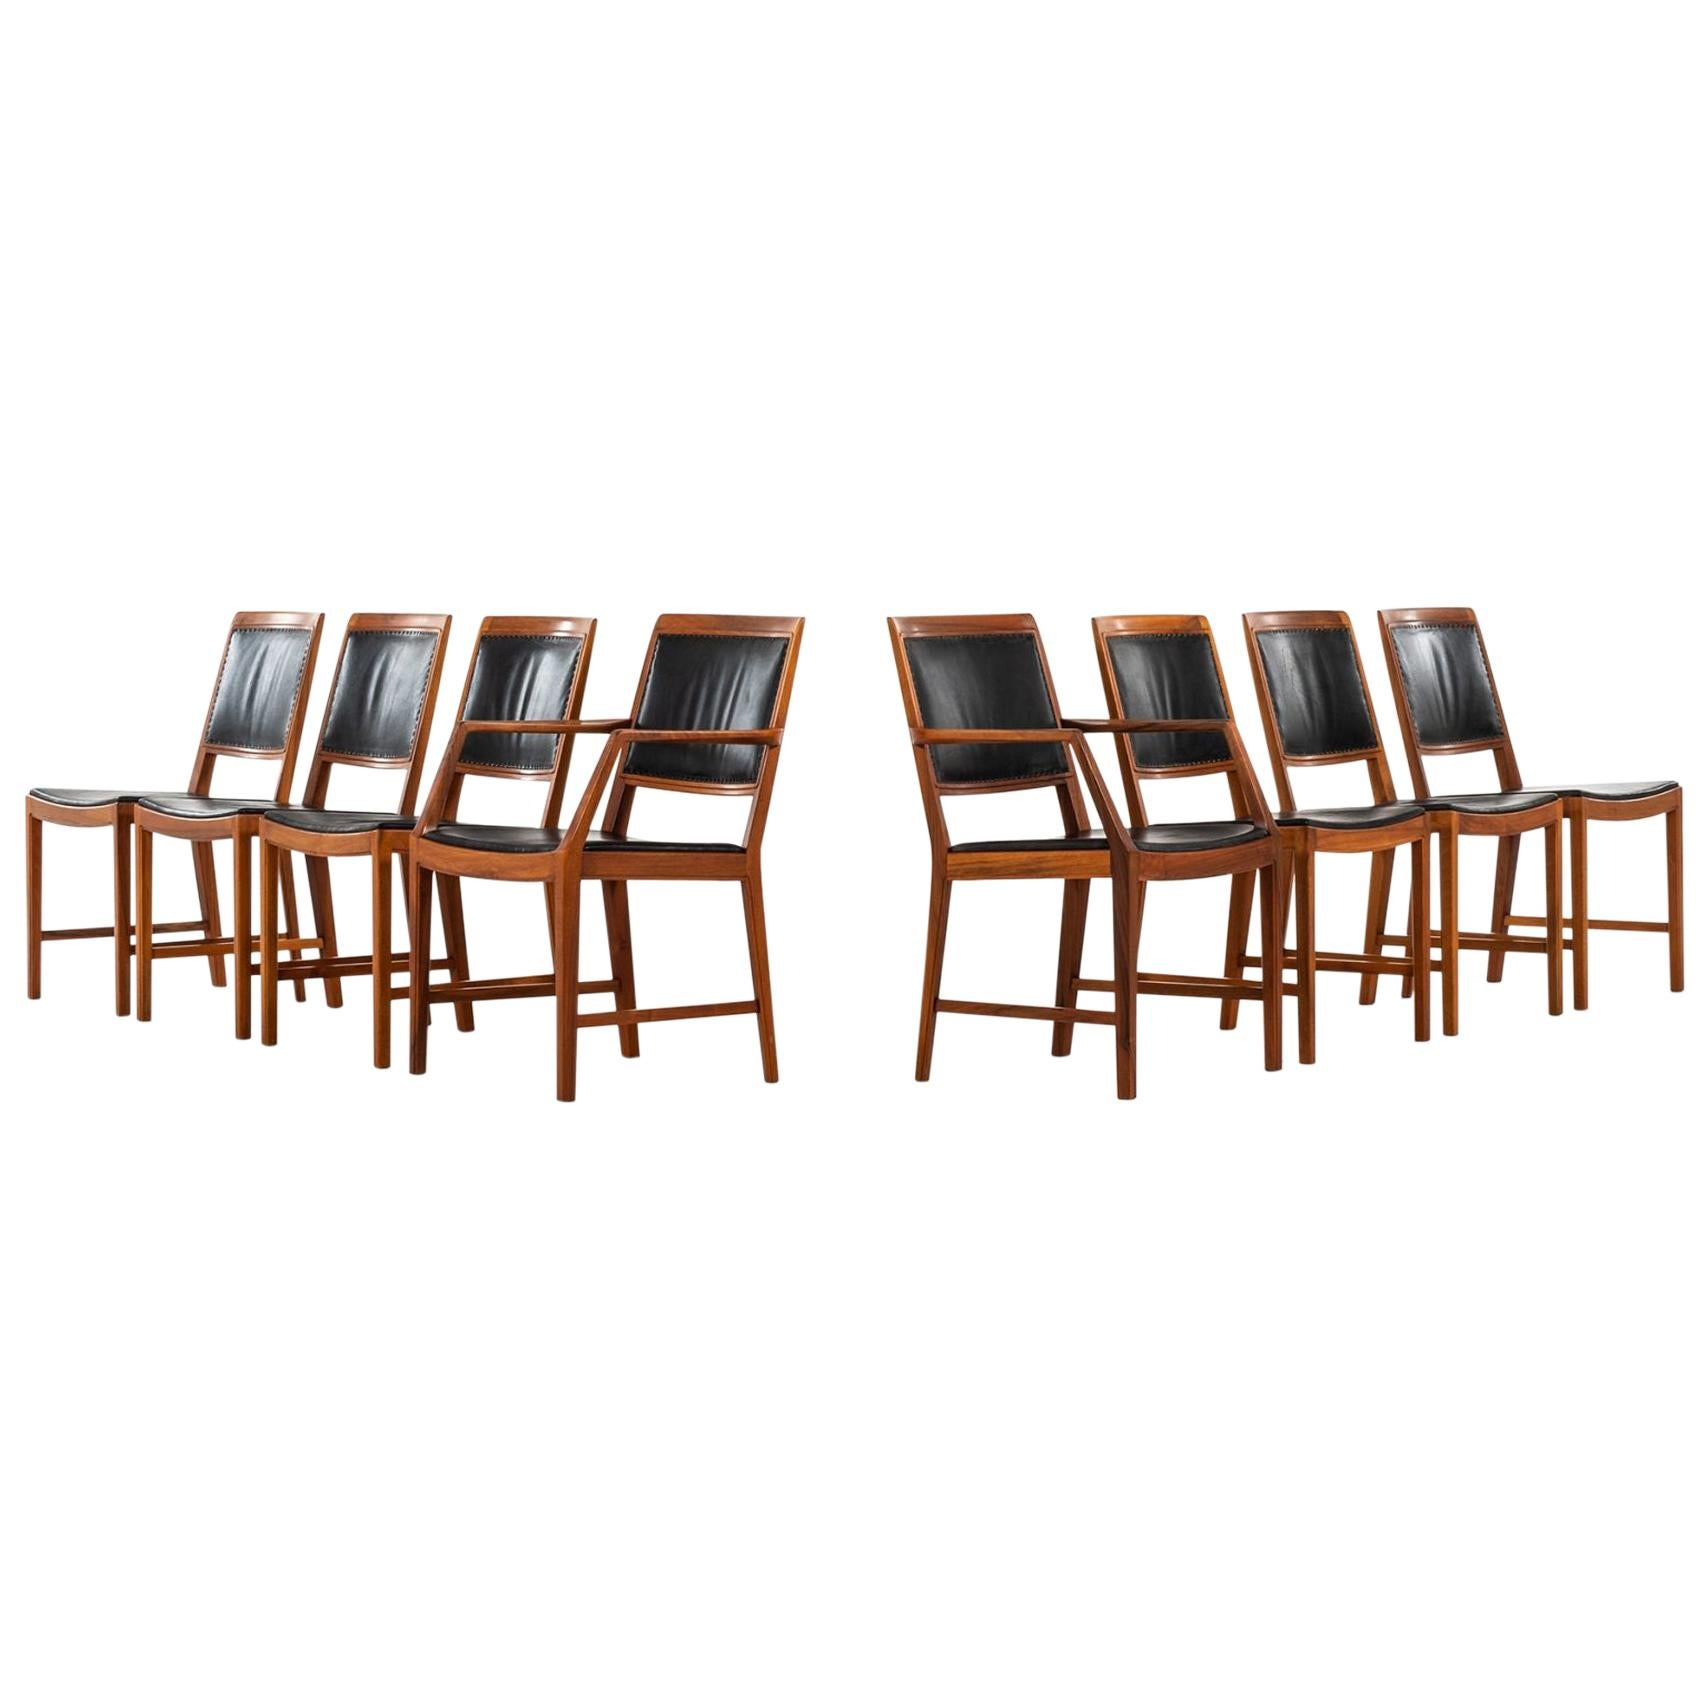 Bertil Fridhagen Dining Chairs Model Diamant Produced by Bodafors in Sweden